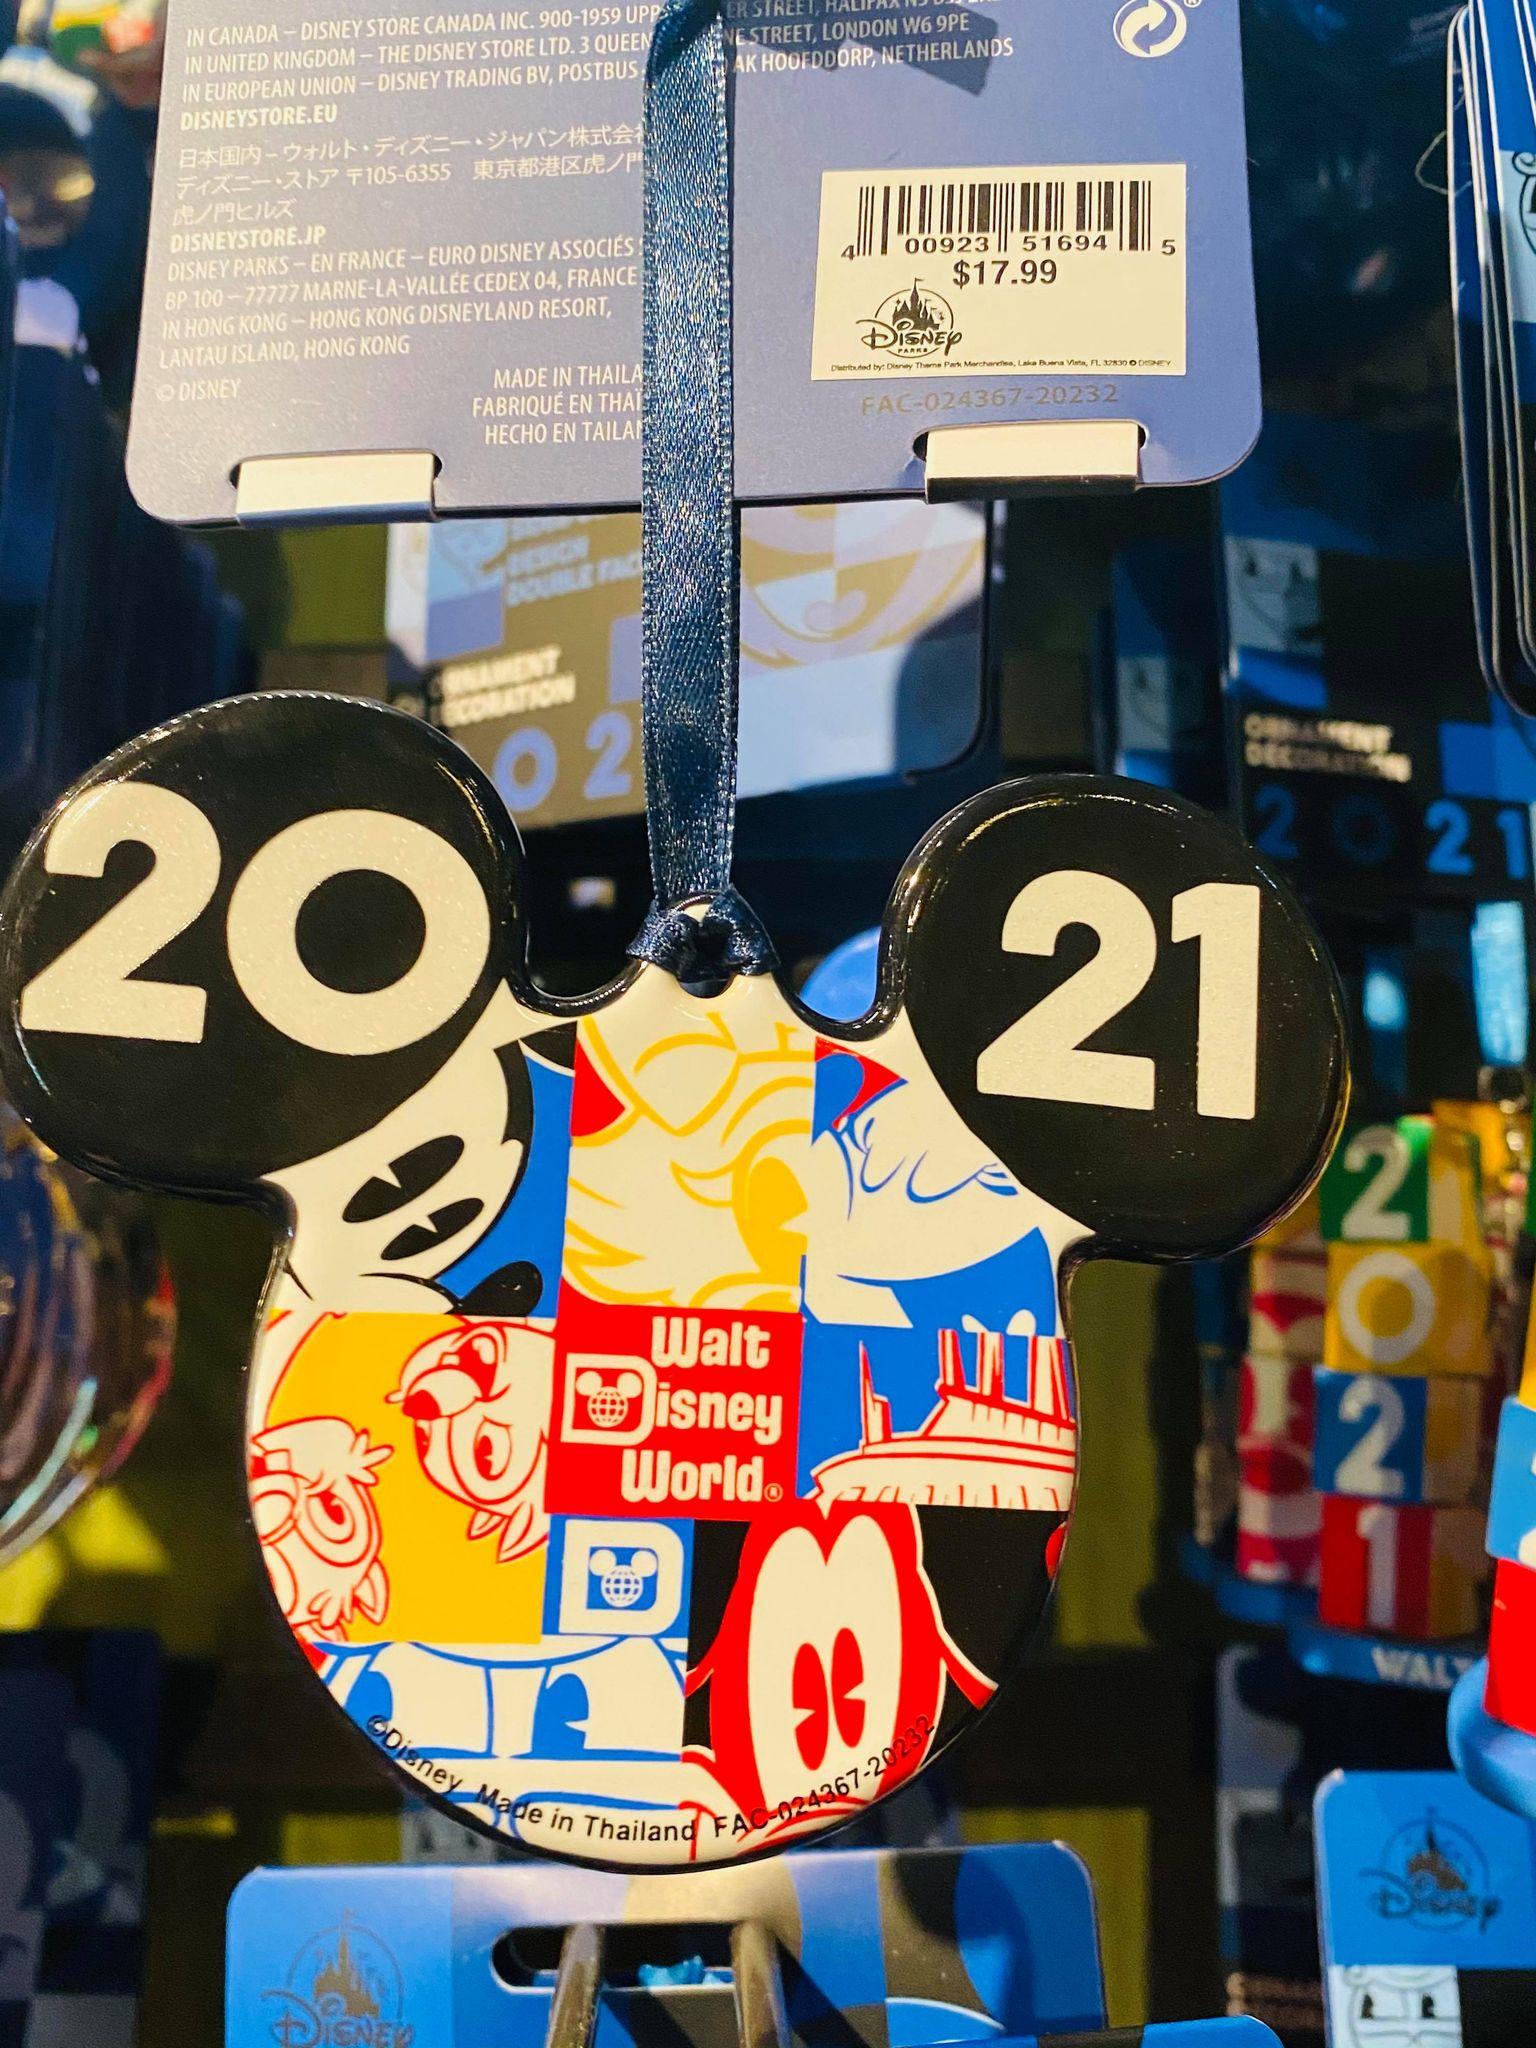 Disney 2021 Christmas Ornament 2021 Christmas Ornaments Have Arrived At Walt Disney World Photos Disney Fashion Blog